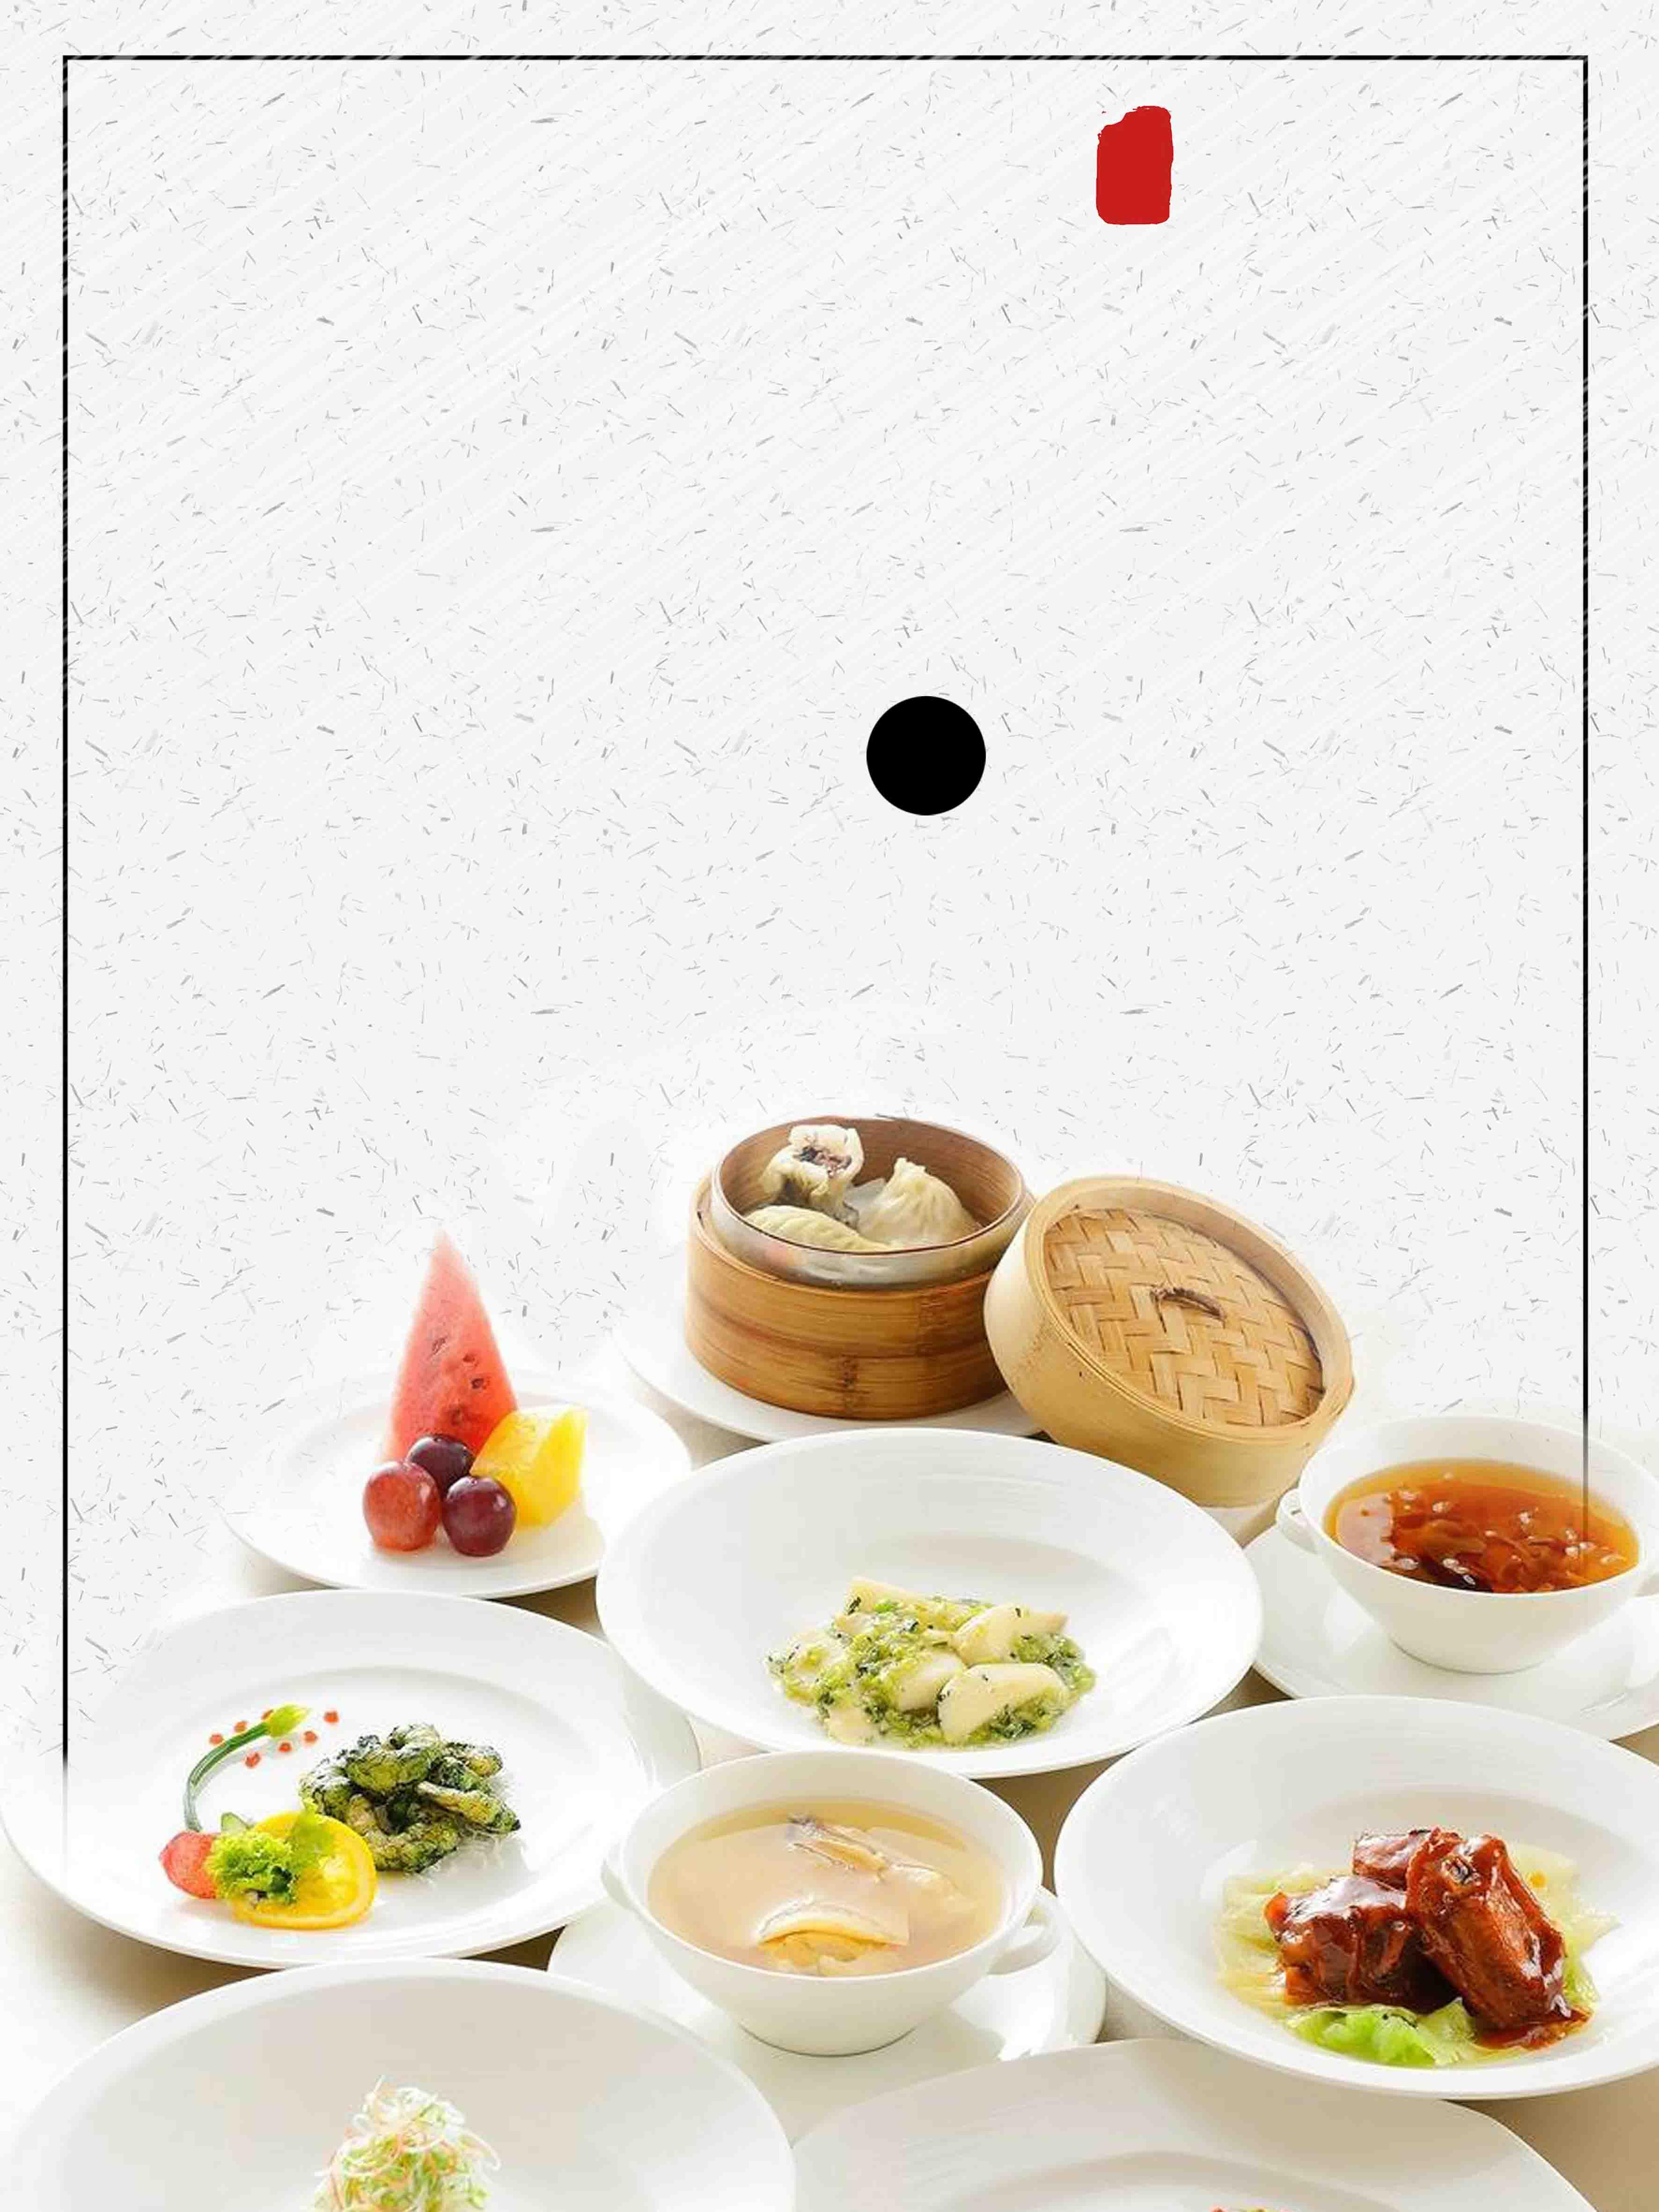 plate food meal refreshment background dish lunch restaurant background image for free download. Black Bedroom Furniture Sets. Home Design Ideas